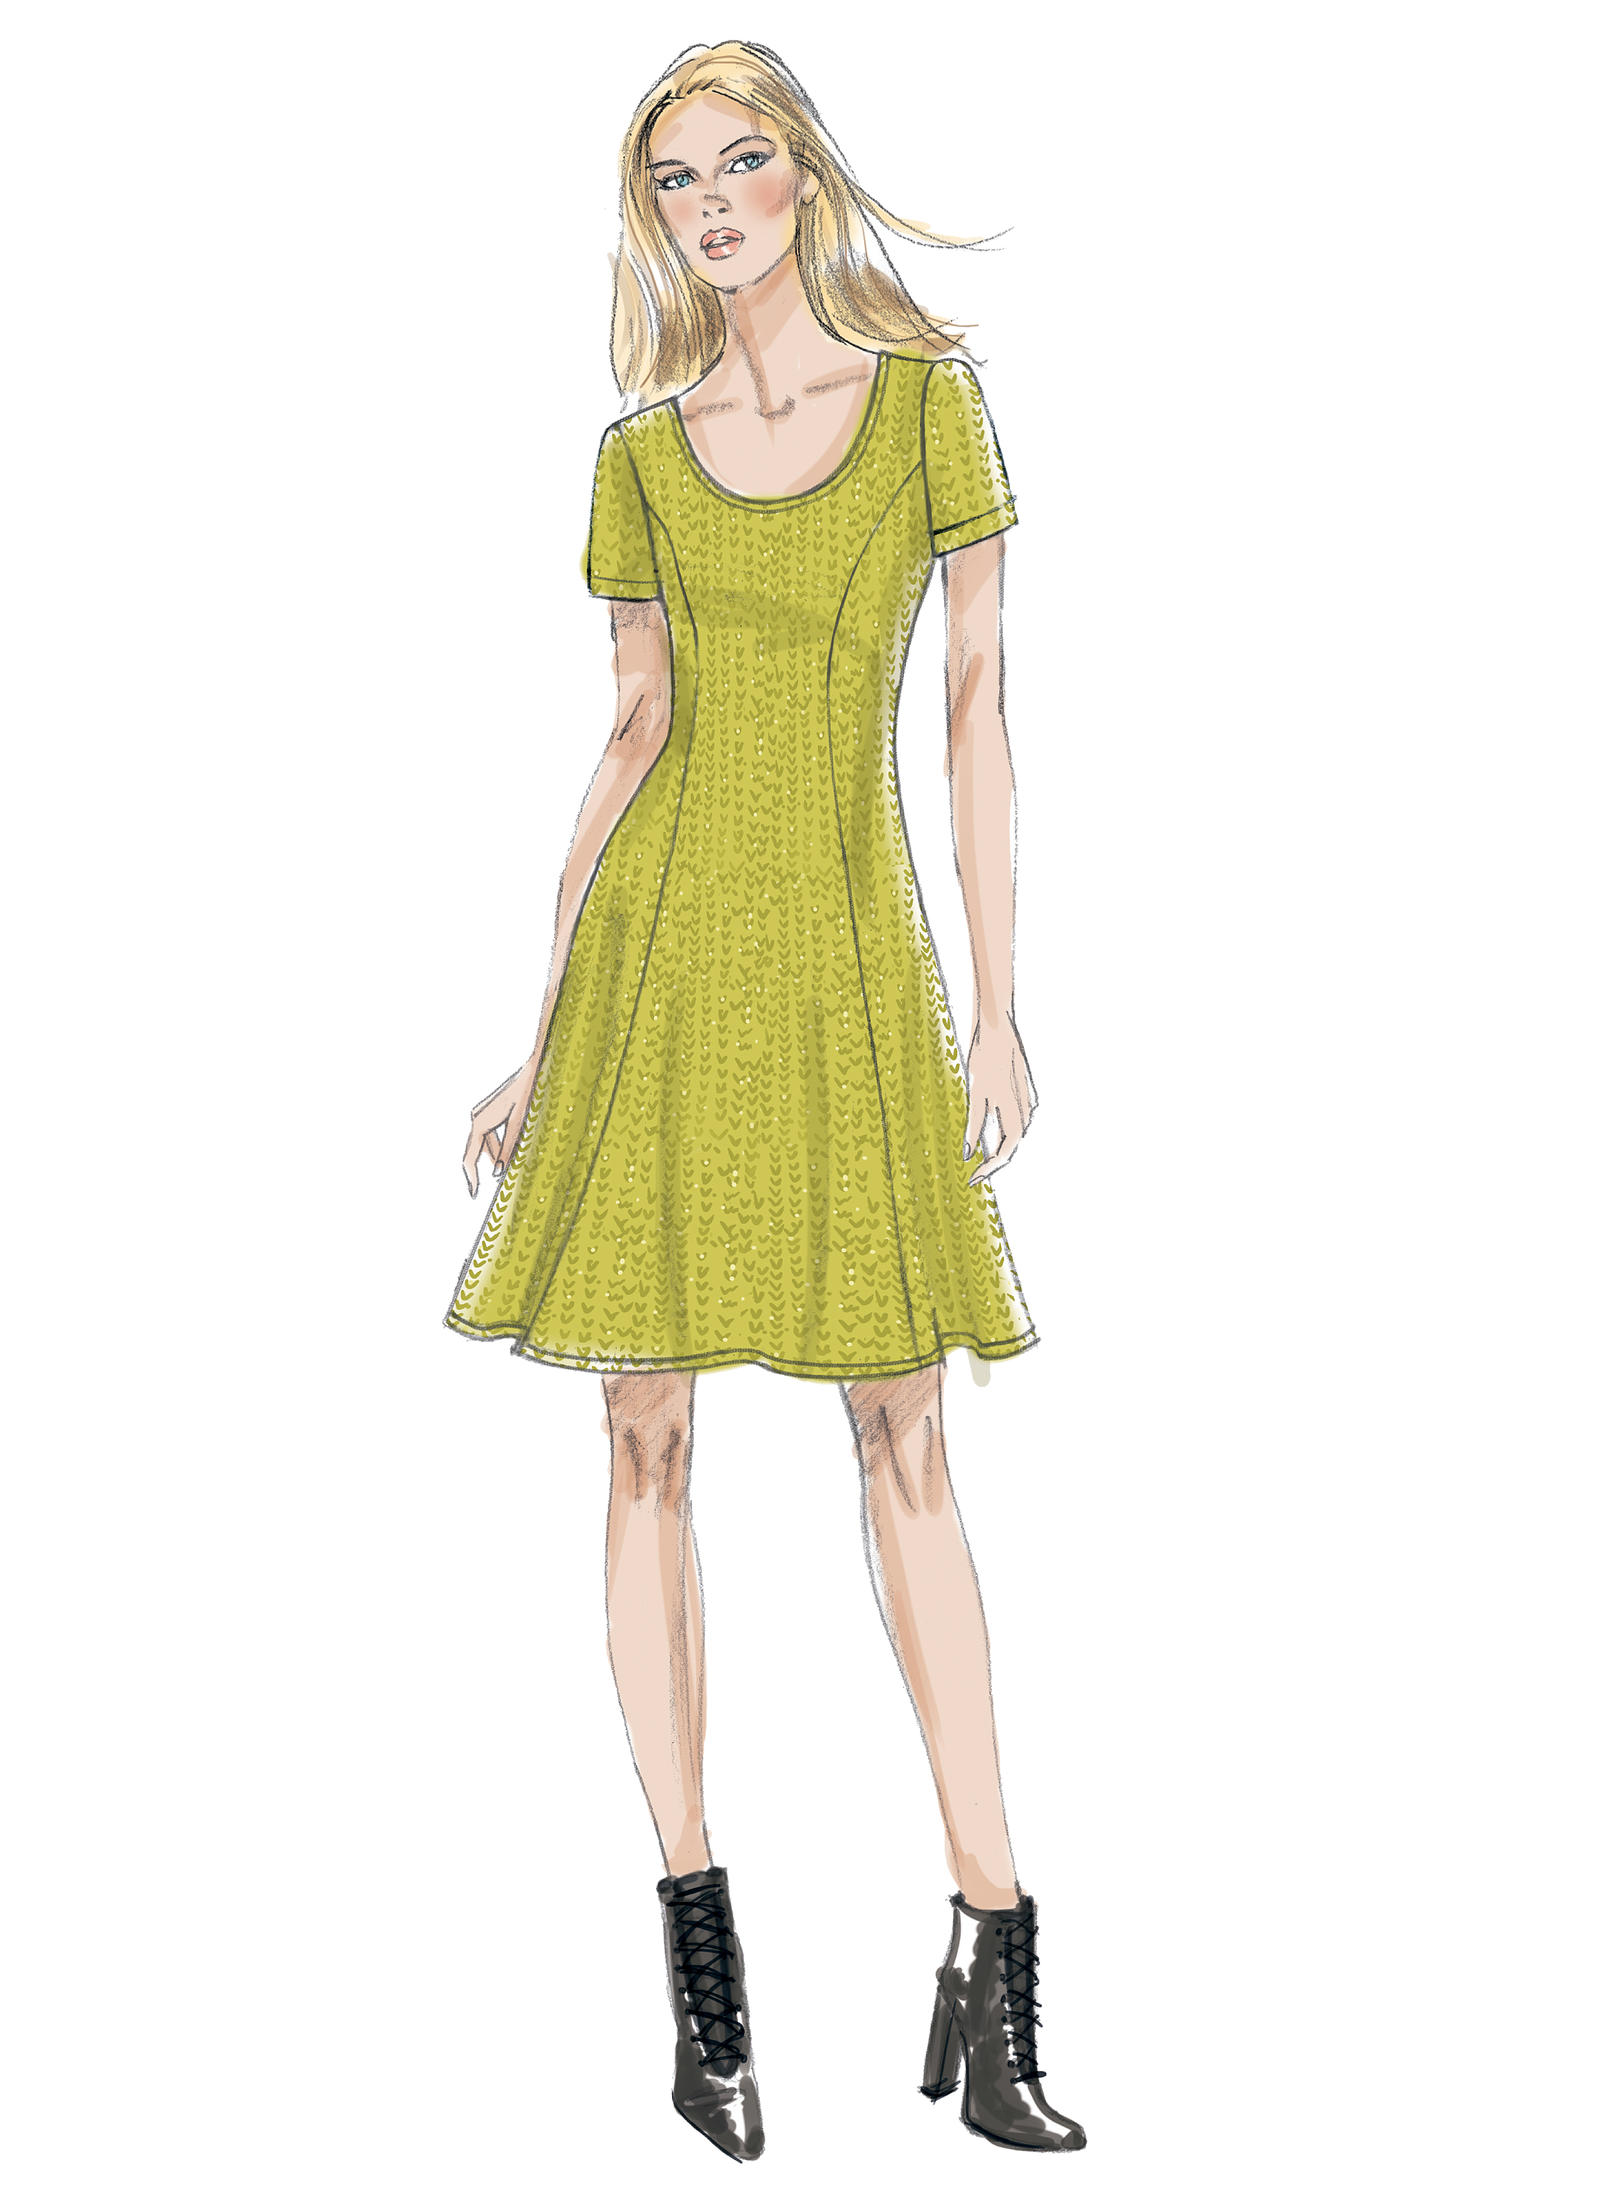 Vogue Patterns 9199 MISSES\' KNIT FIT-AND-FLARE DRESSES